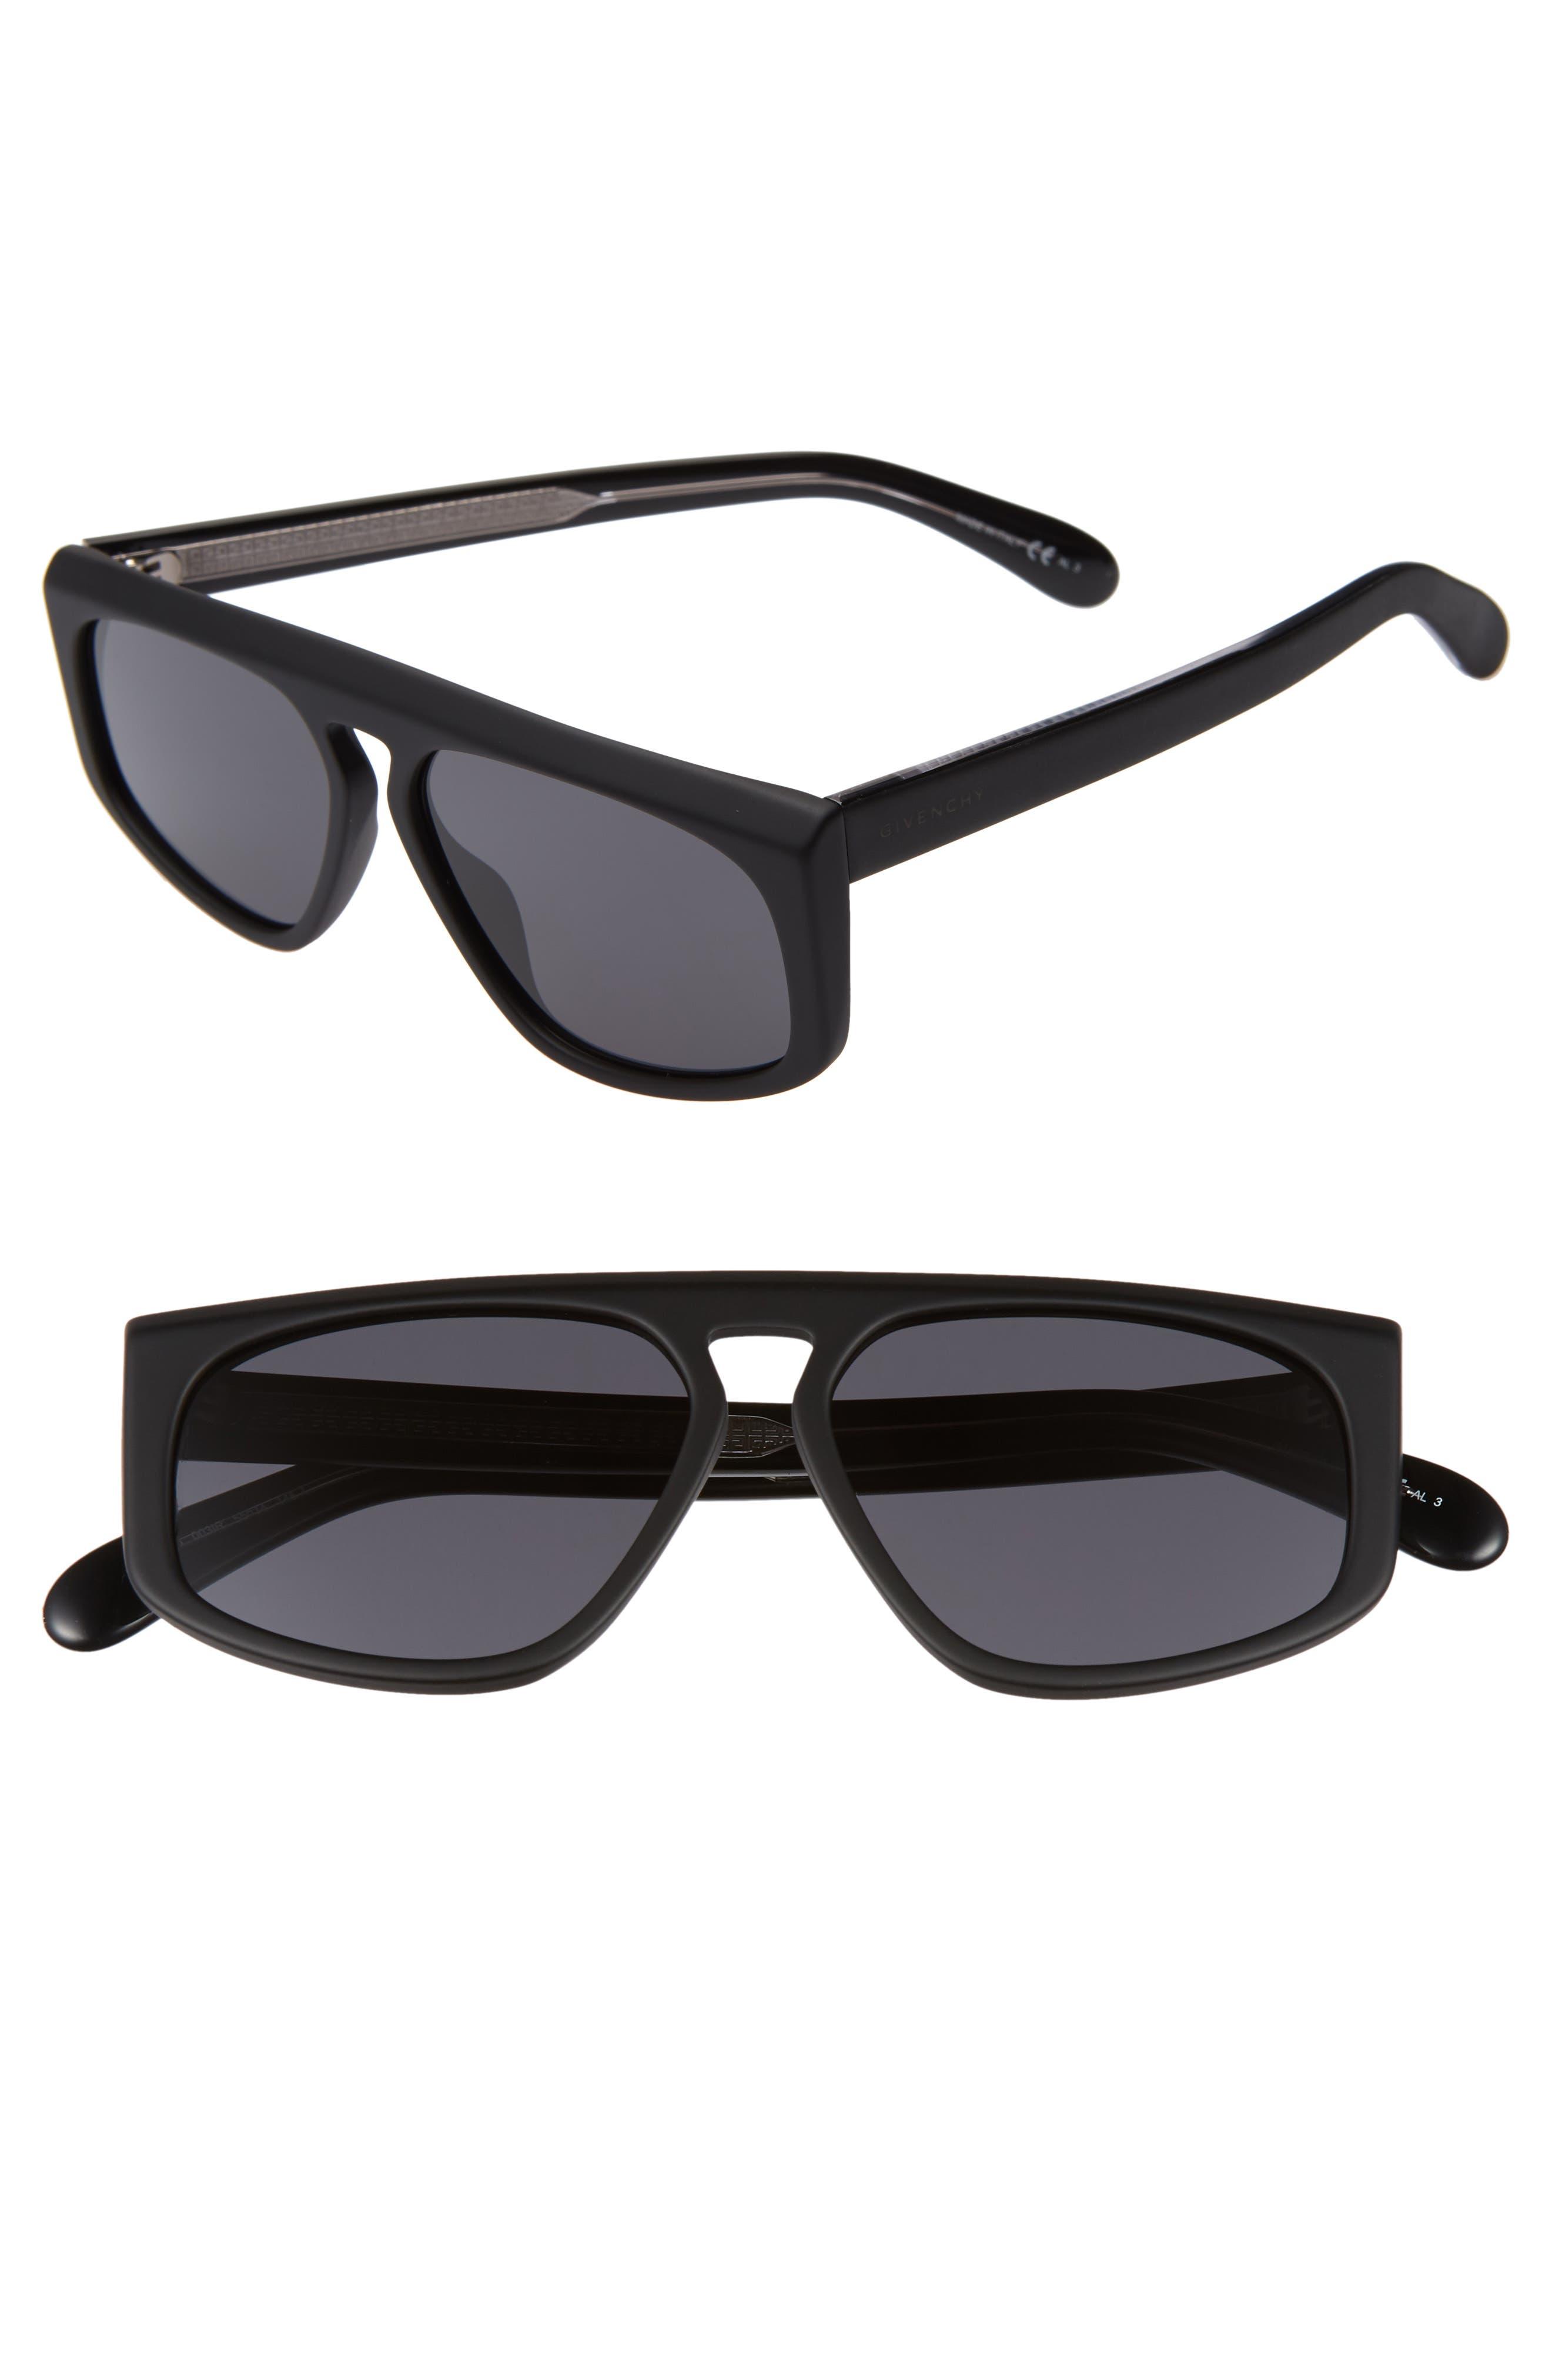 55mm Flat Top Sunglasses,                             Main thumbnail 1, color,                             MATTE BLACK